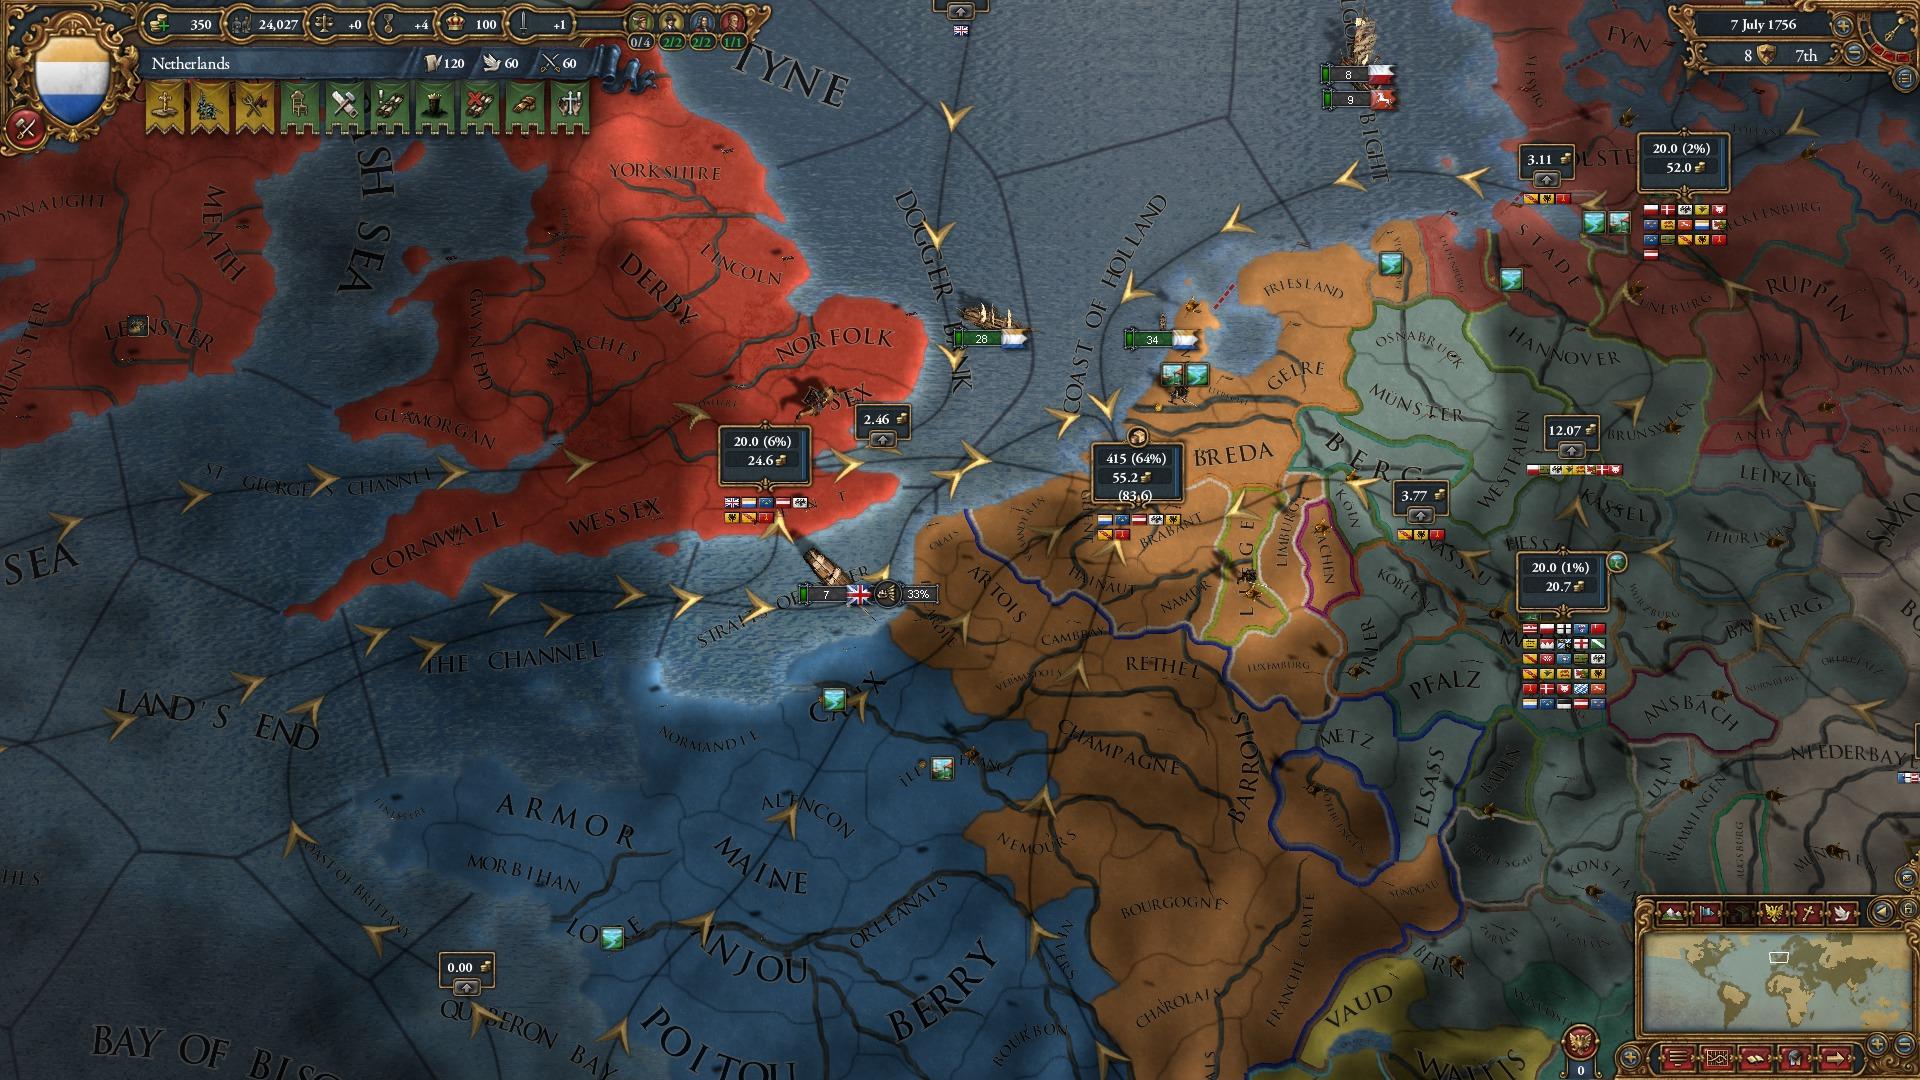 europa-universalis-iv-pc-screenshot-1